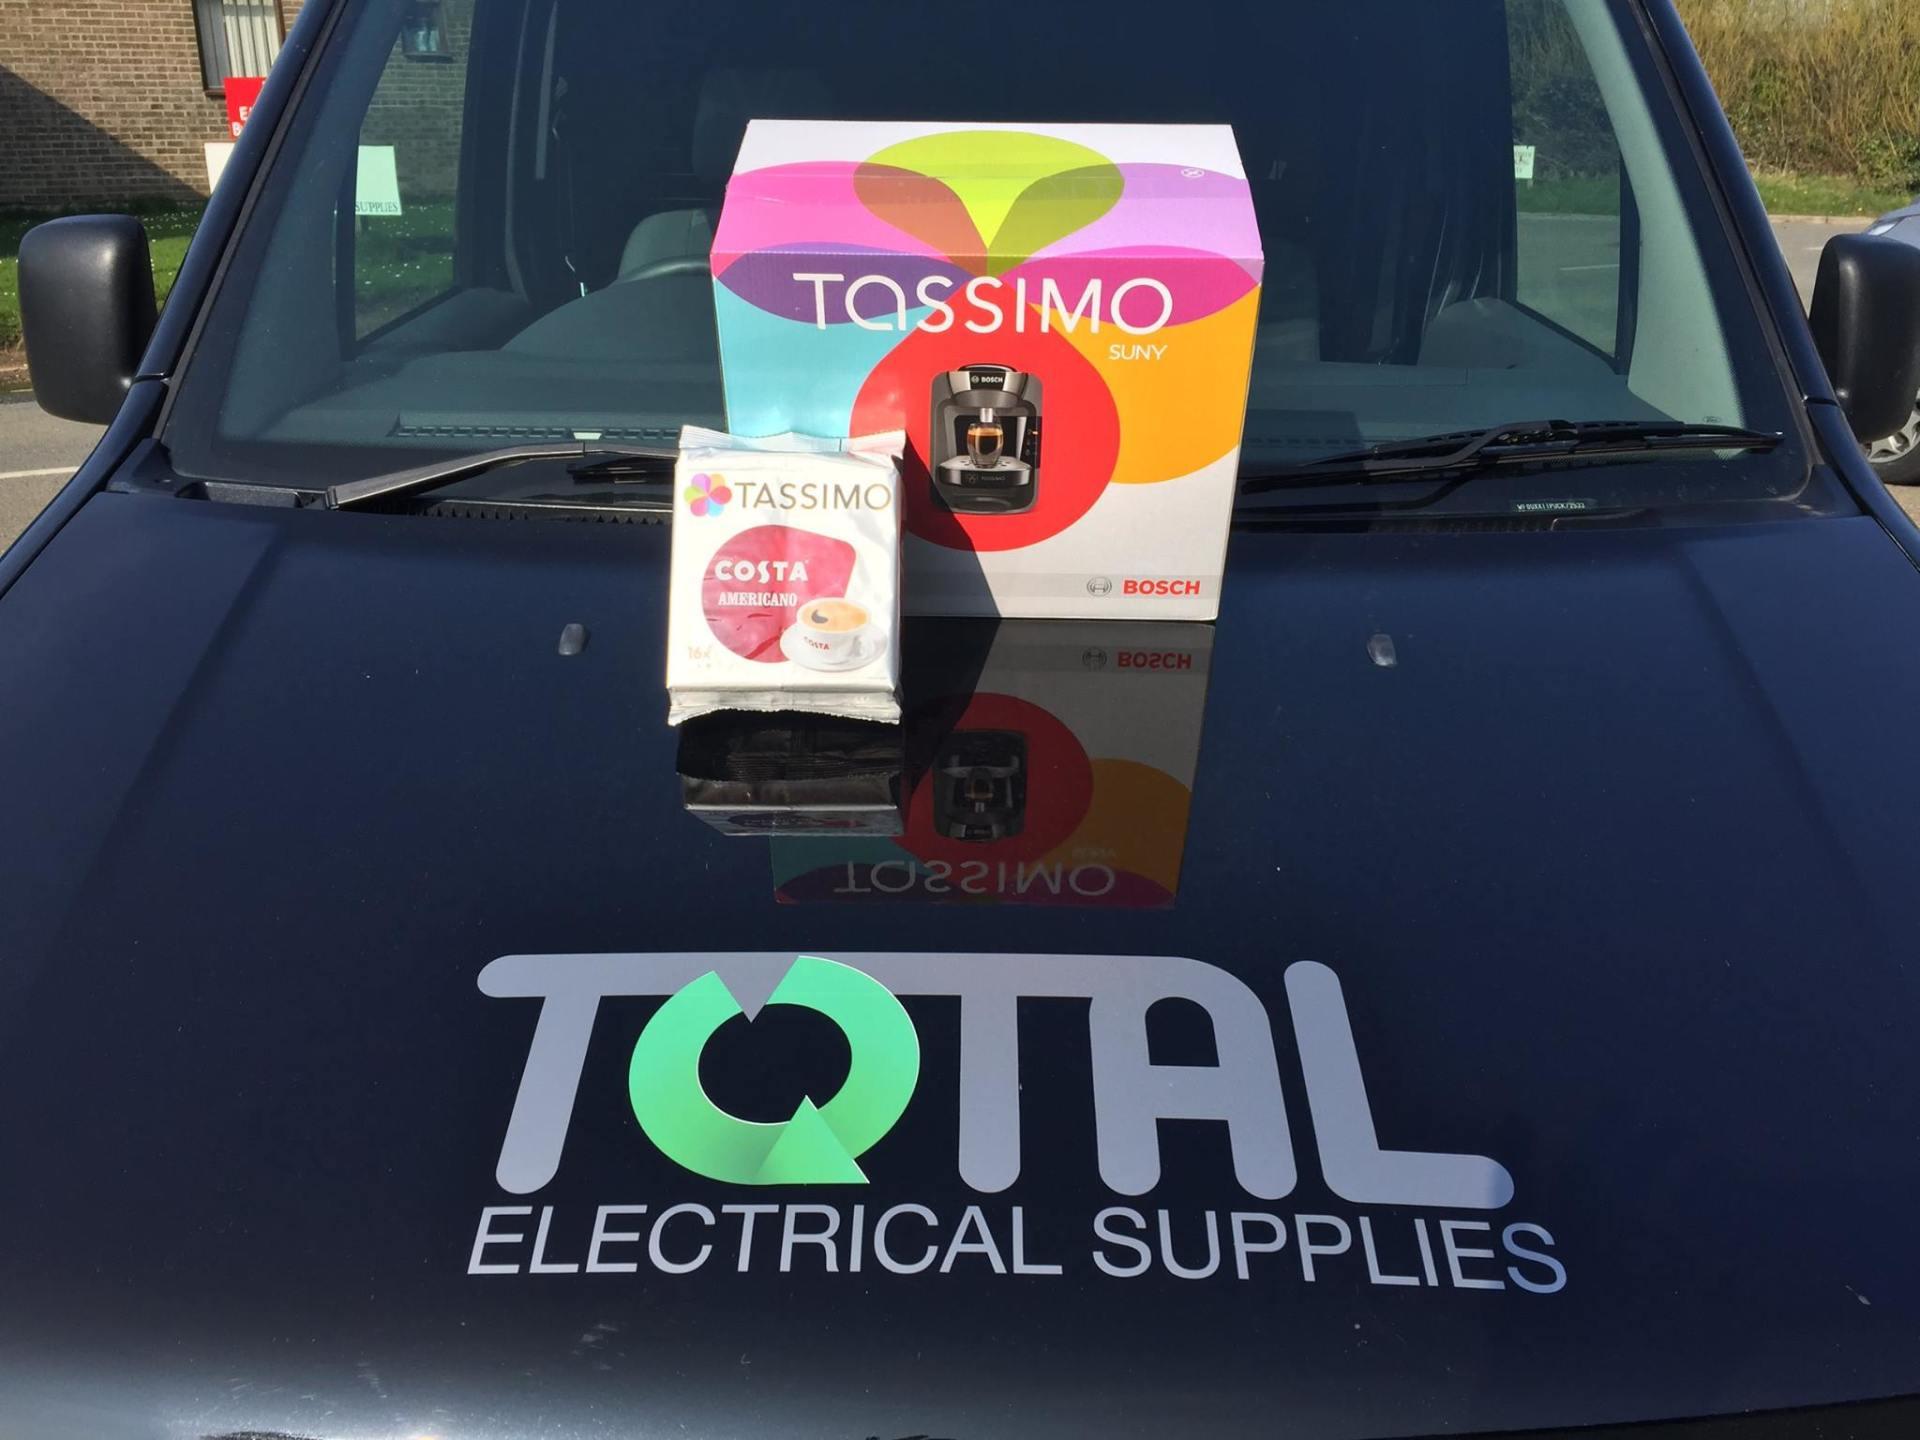 Total Electrical Supplies (IOW) Ltd 2